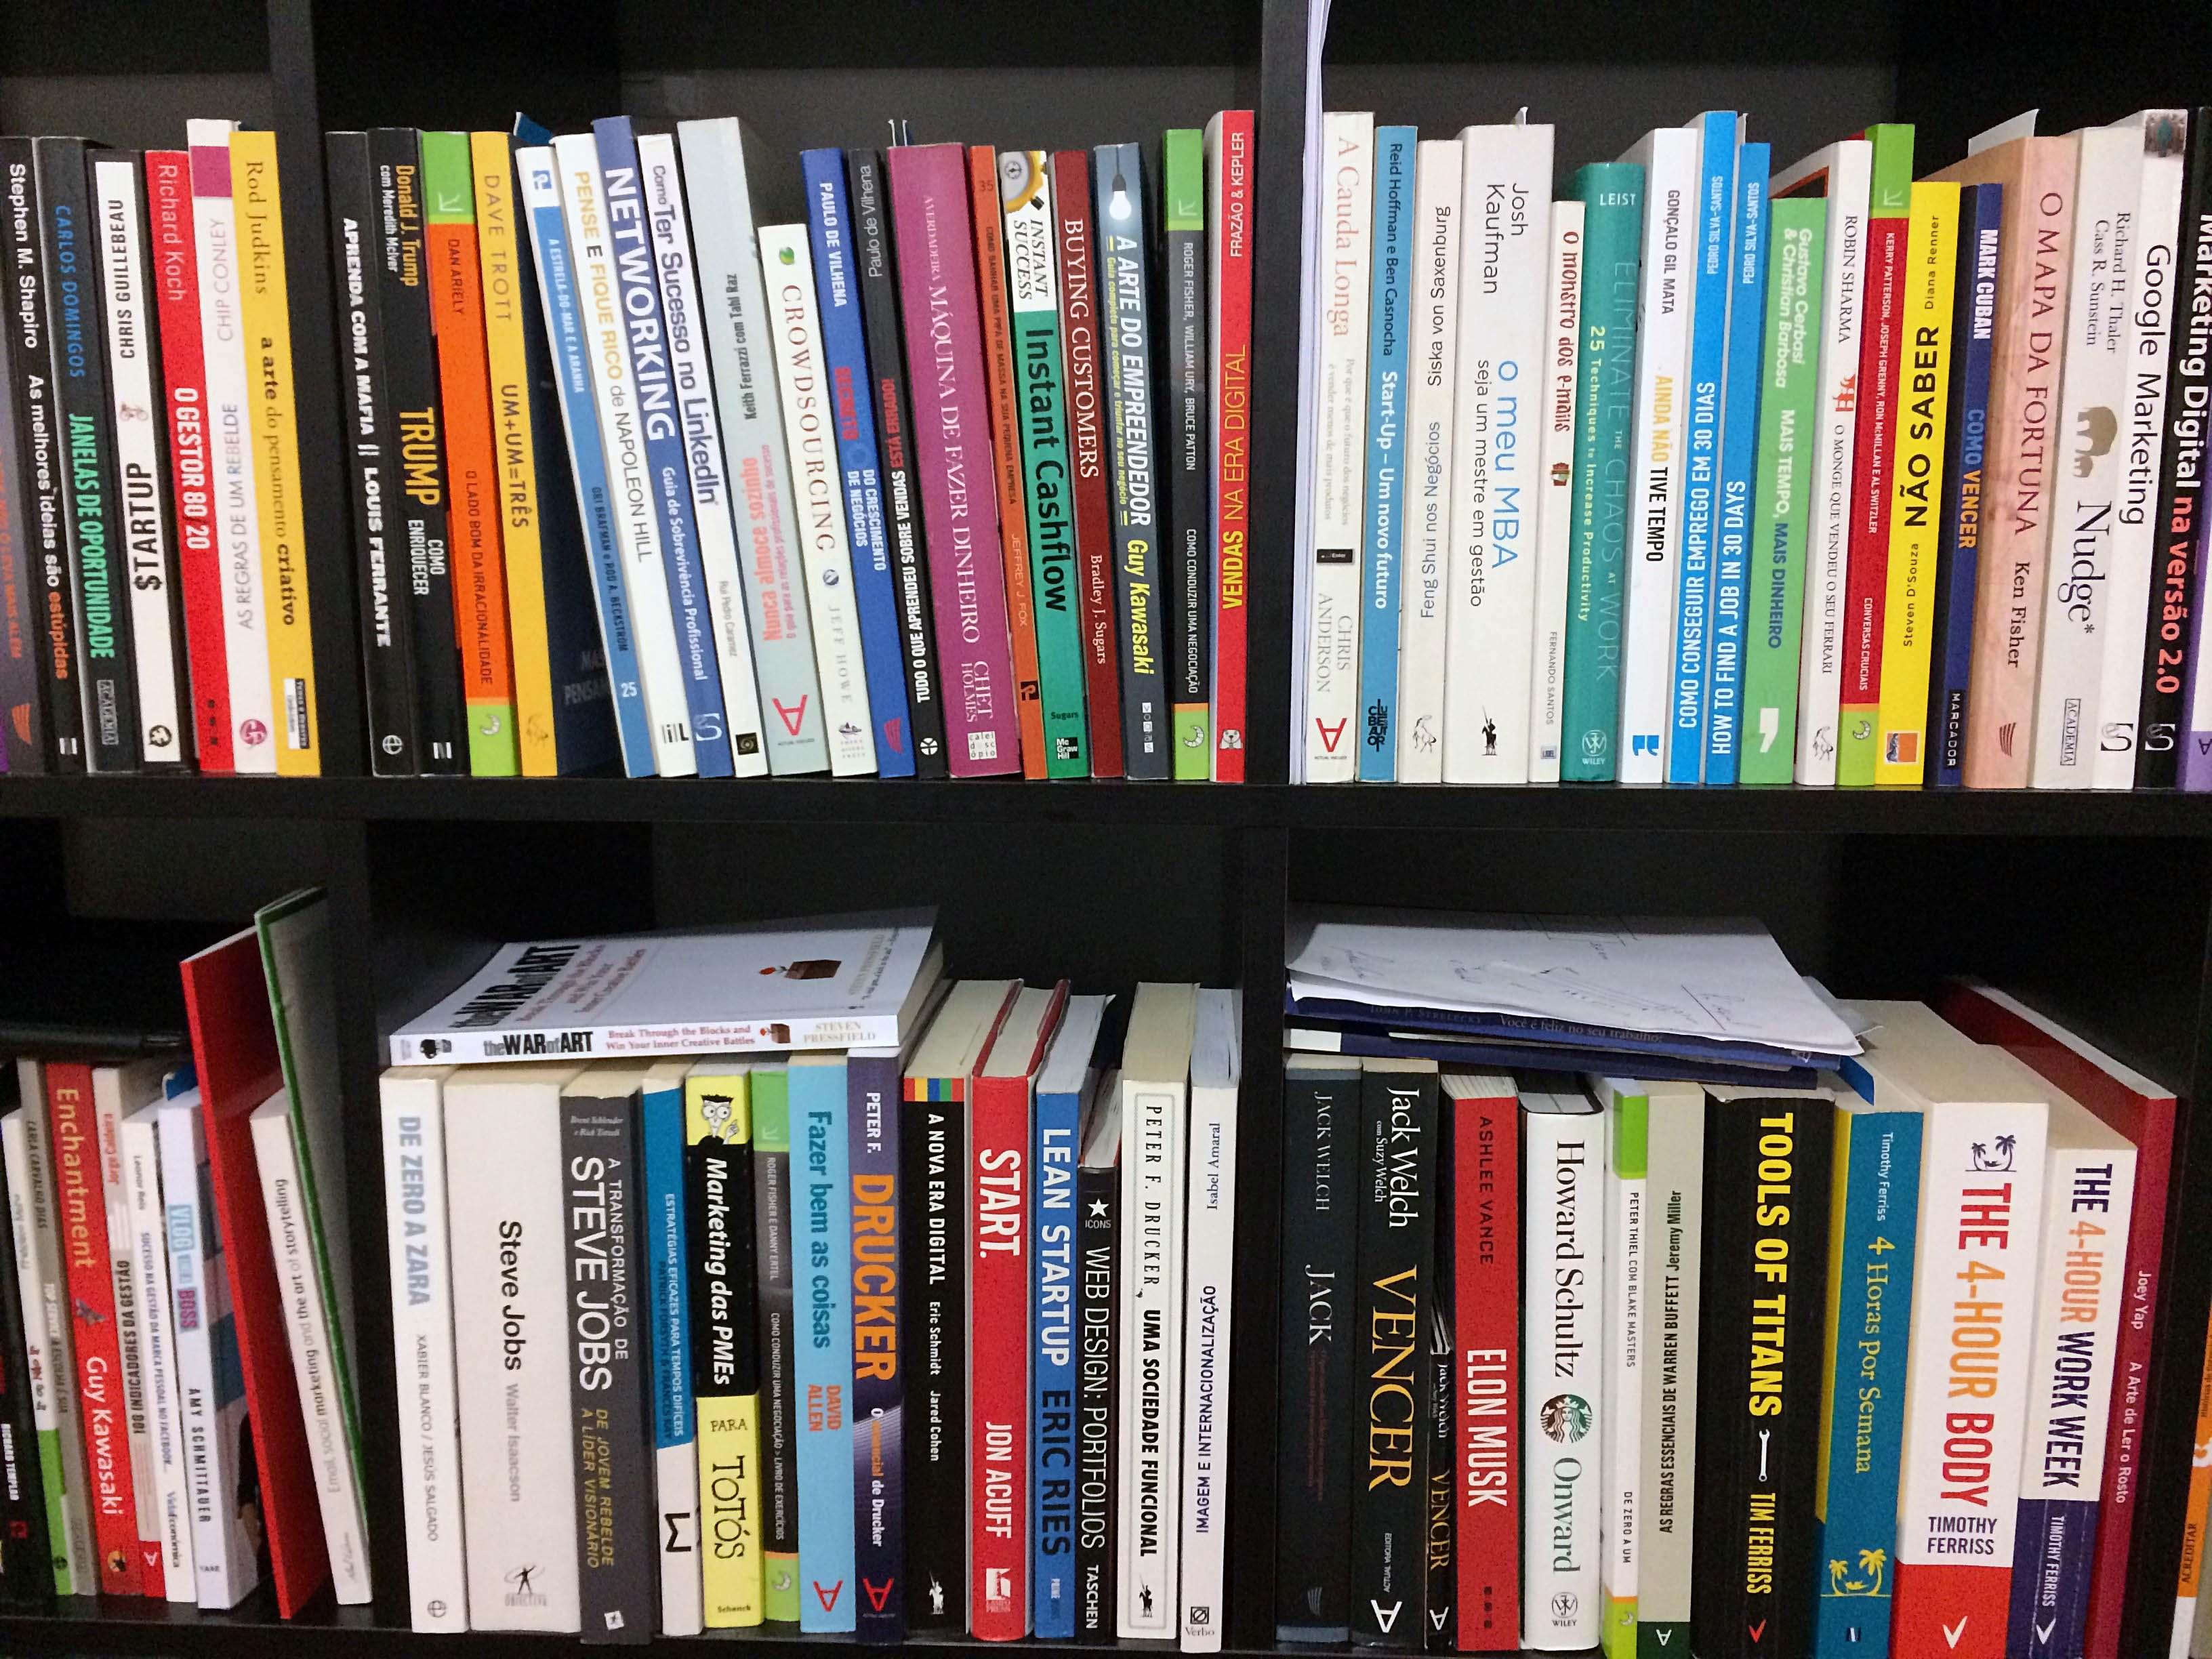 Lista de livros ordenada por Pedro Silva-Santos